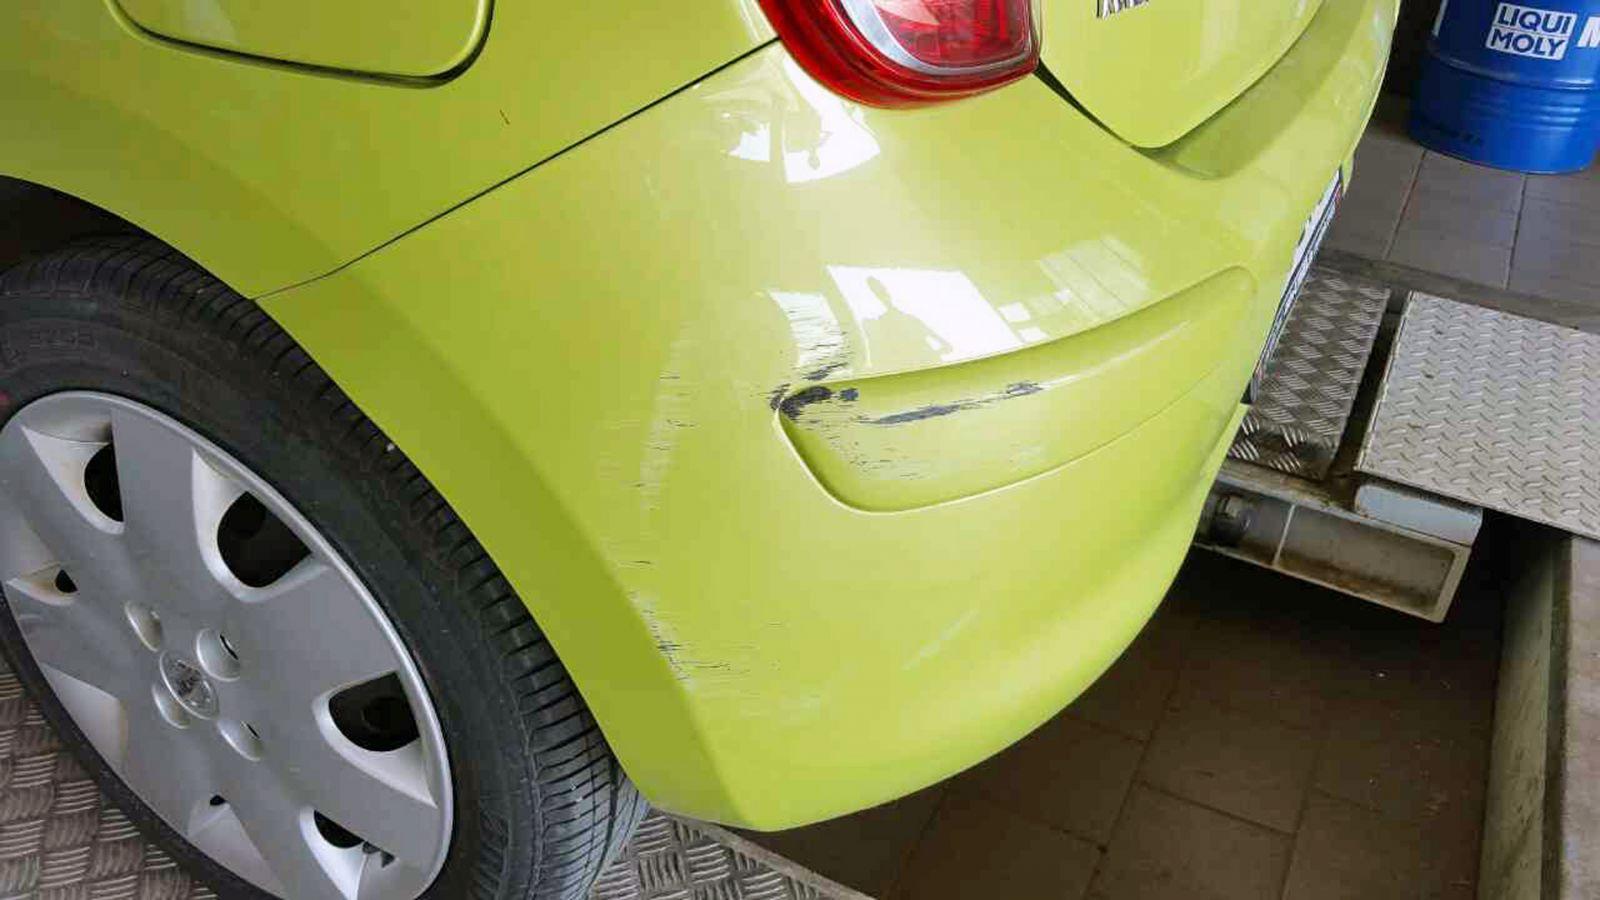 Unfallinstandsetzung Auto Heidingsfelder